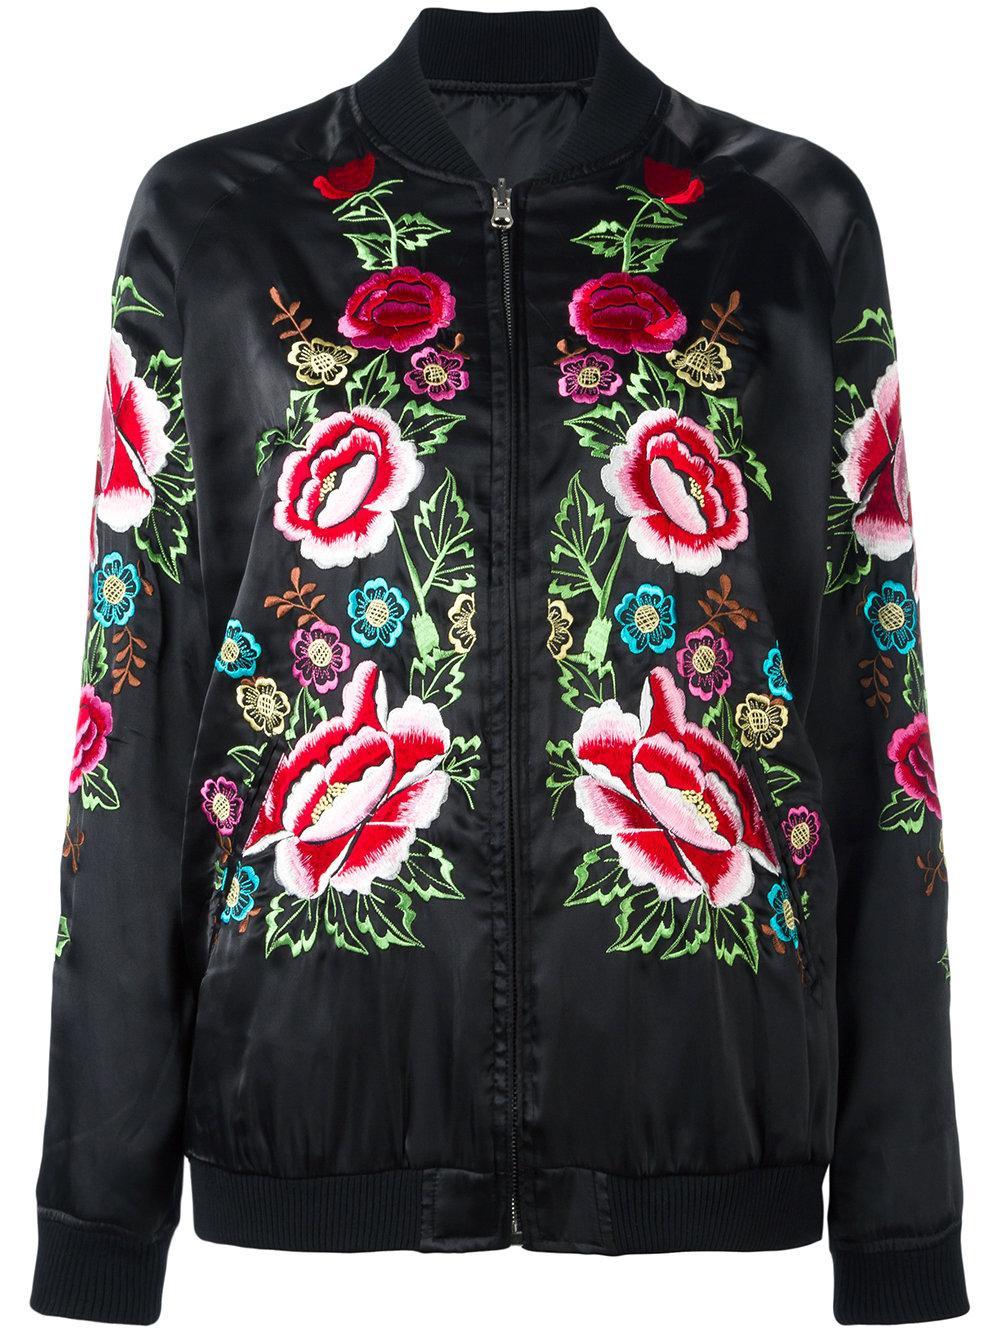 Parosh Rose Embroidered Bomber Jacket In Black  Lyst